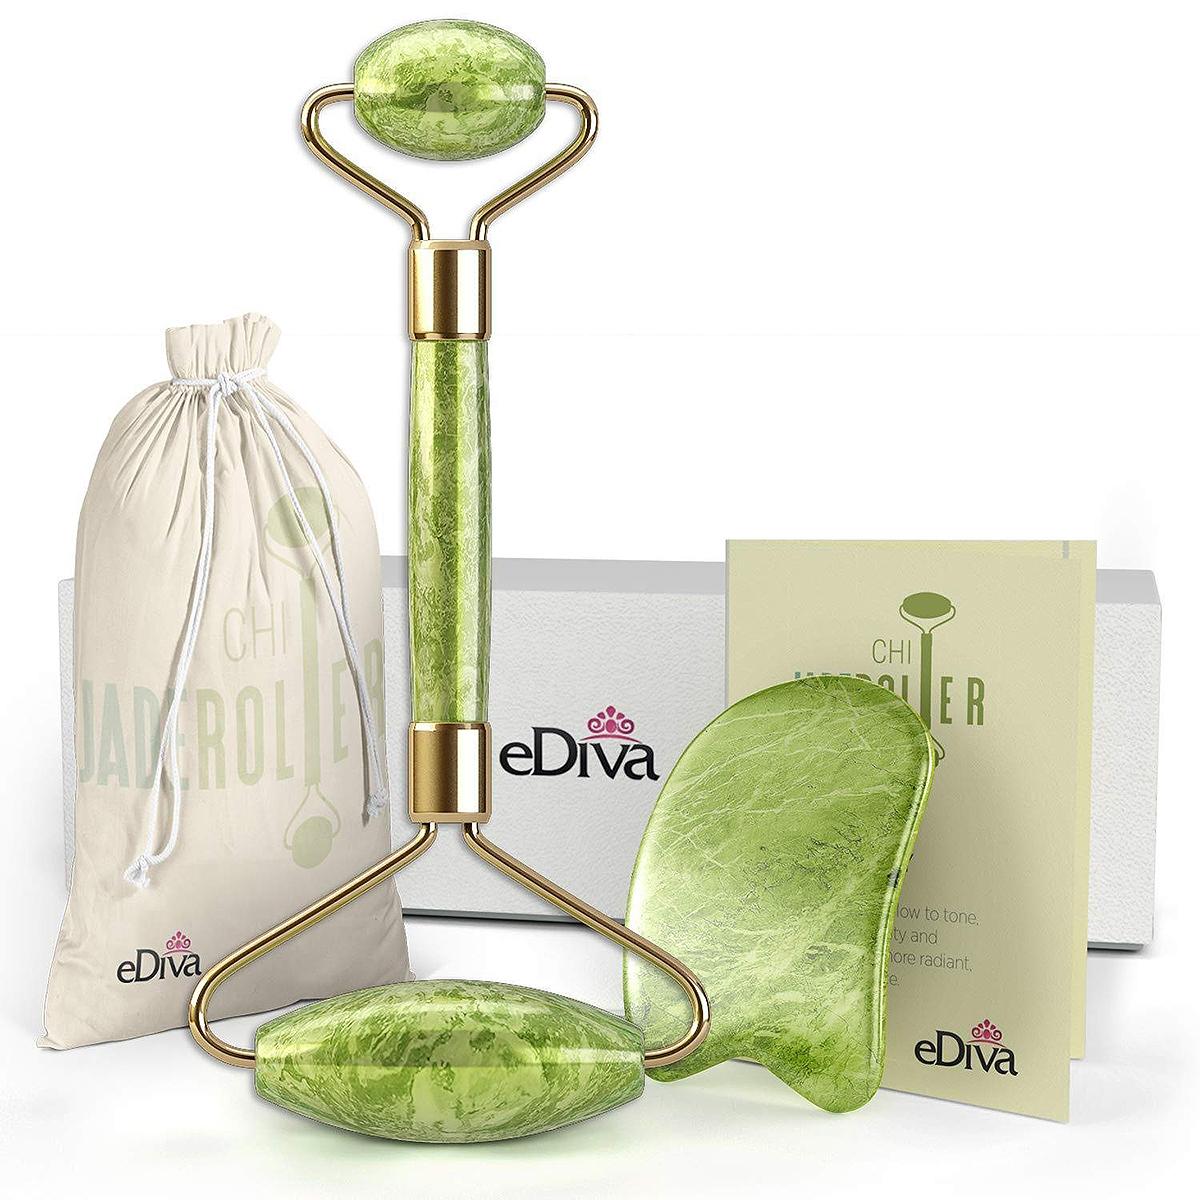 eDiva Natural Jade Roller + Gua Sha set